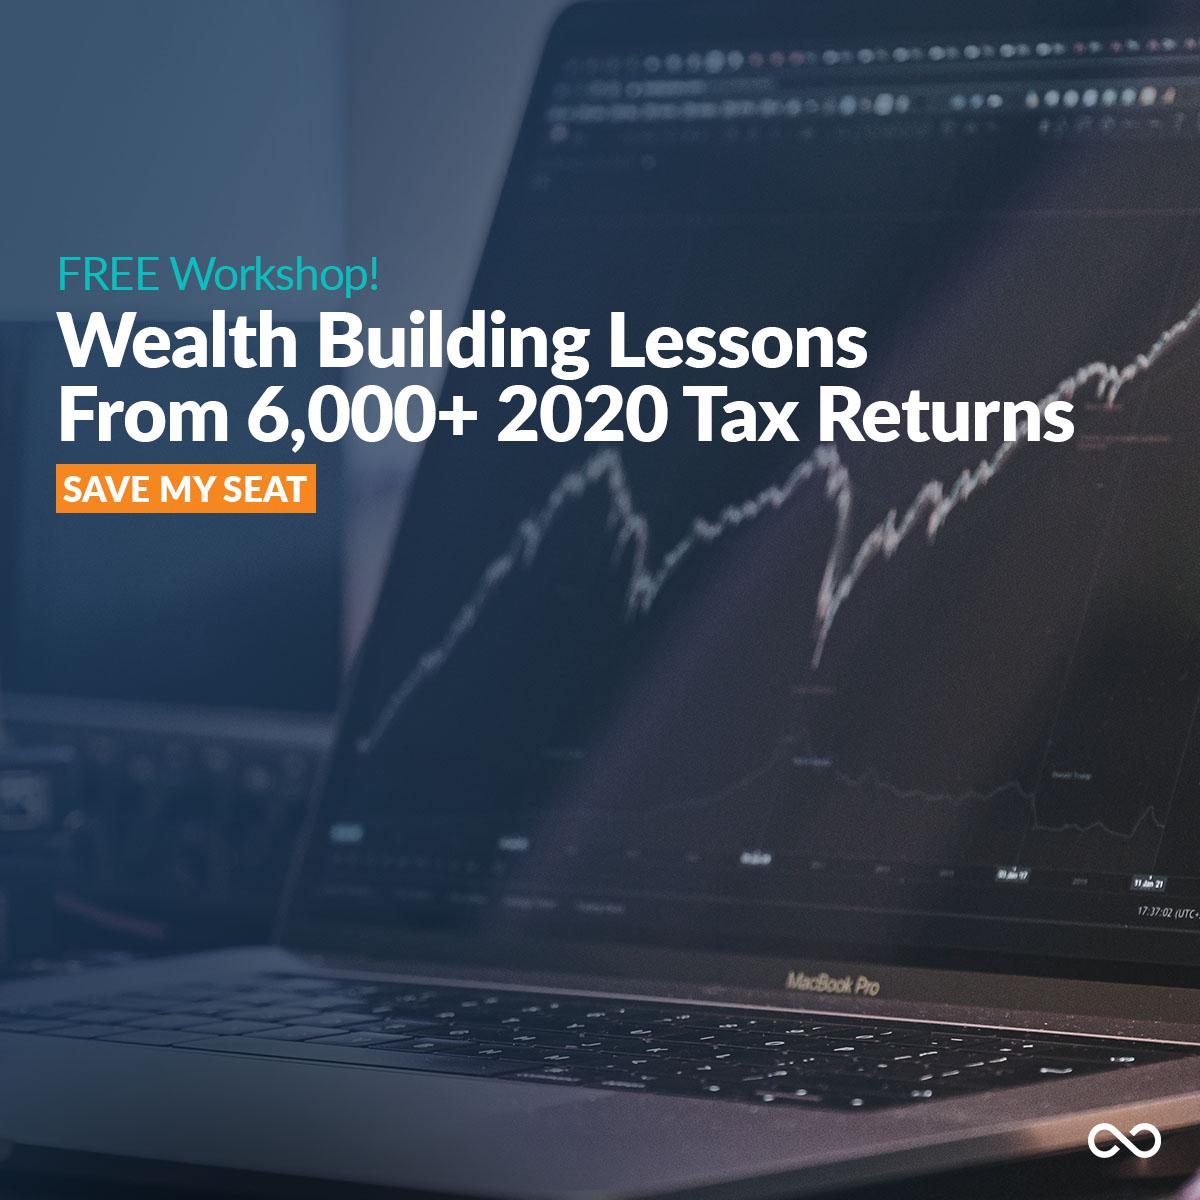 2021.05.20 Infinity Investing Stocks Evergreen1200x1200